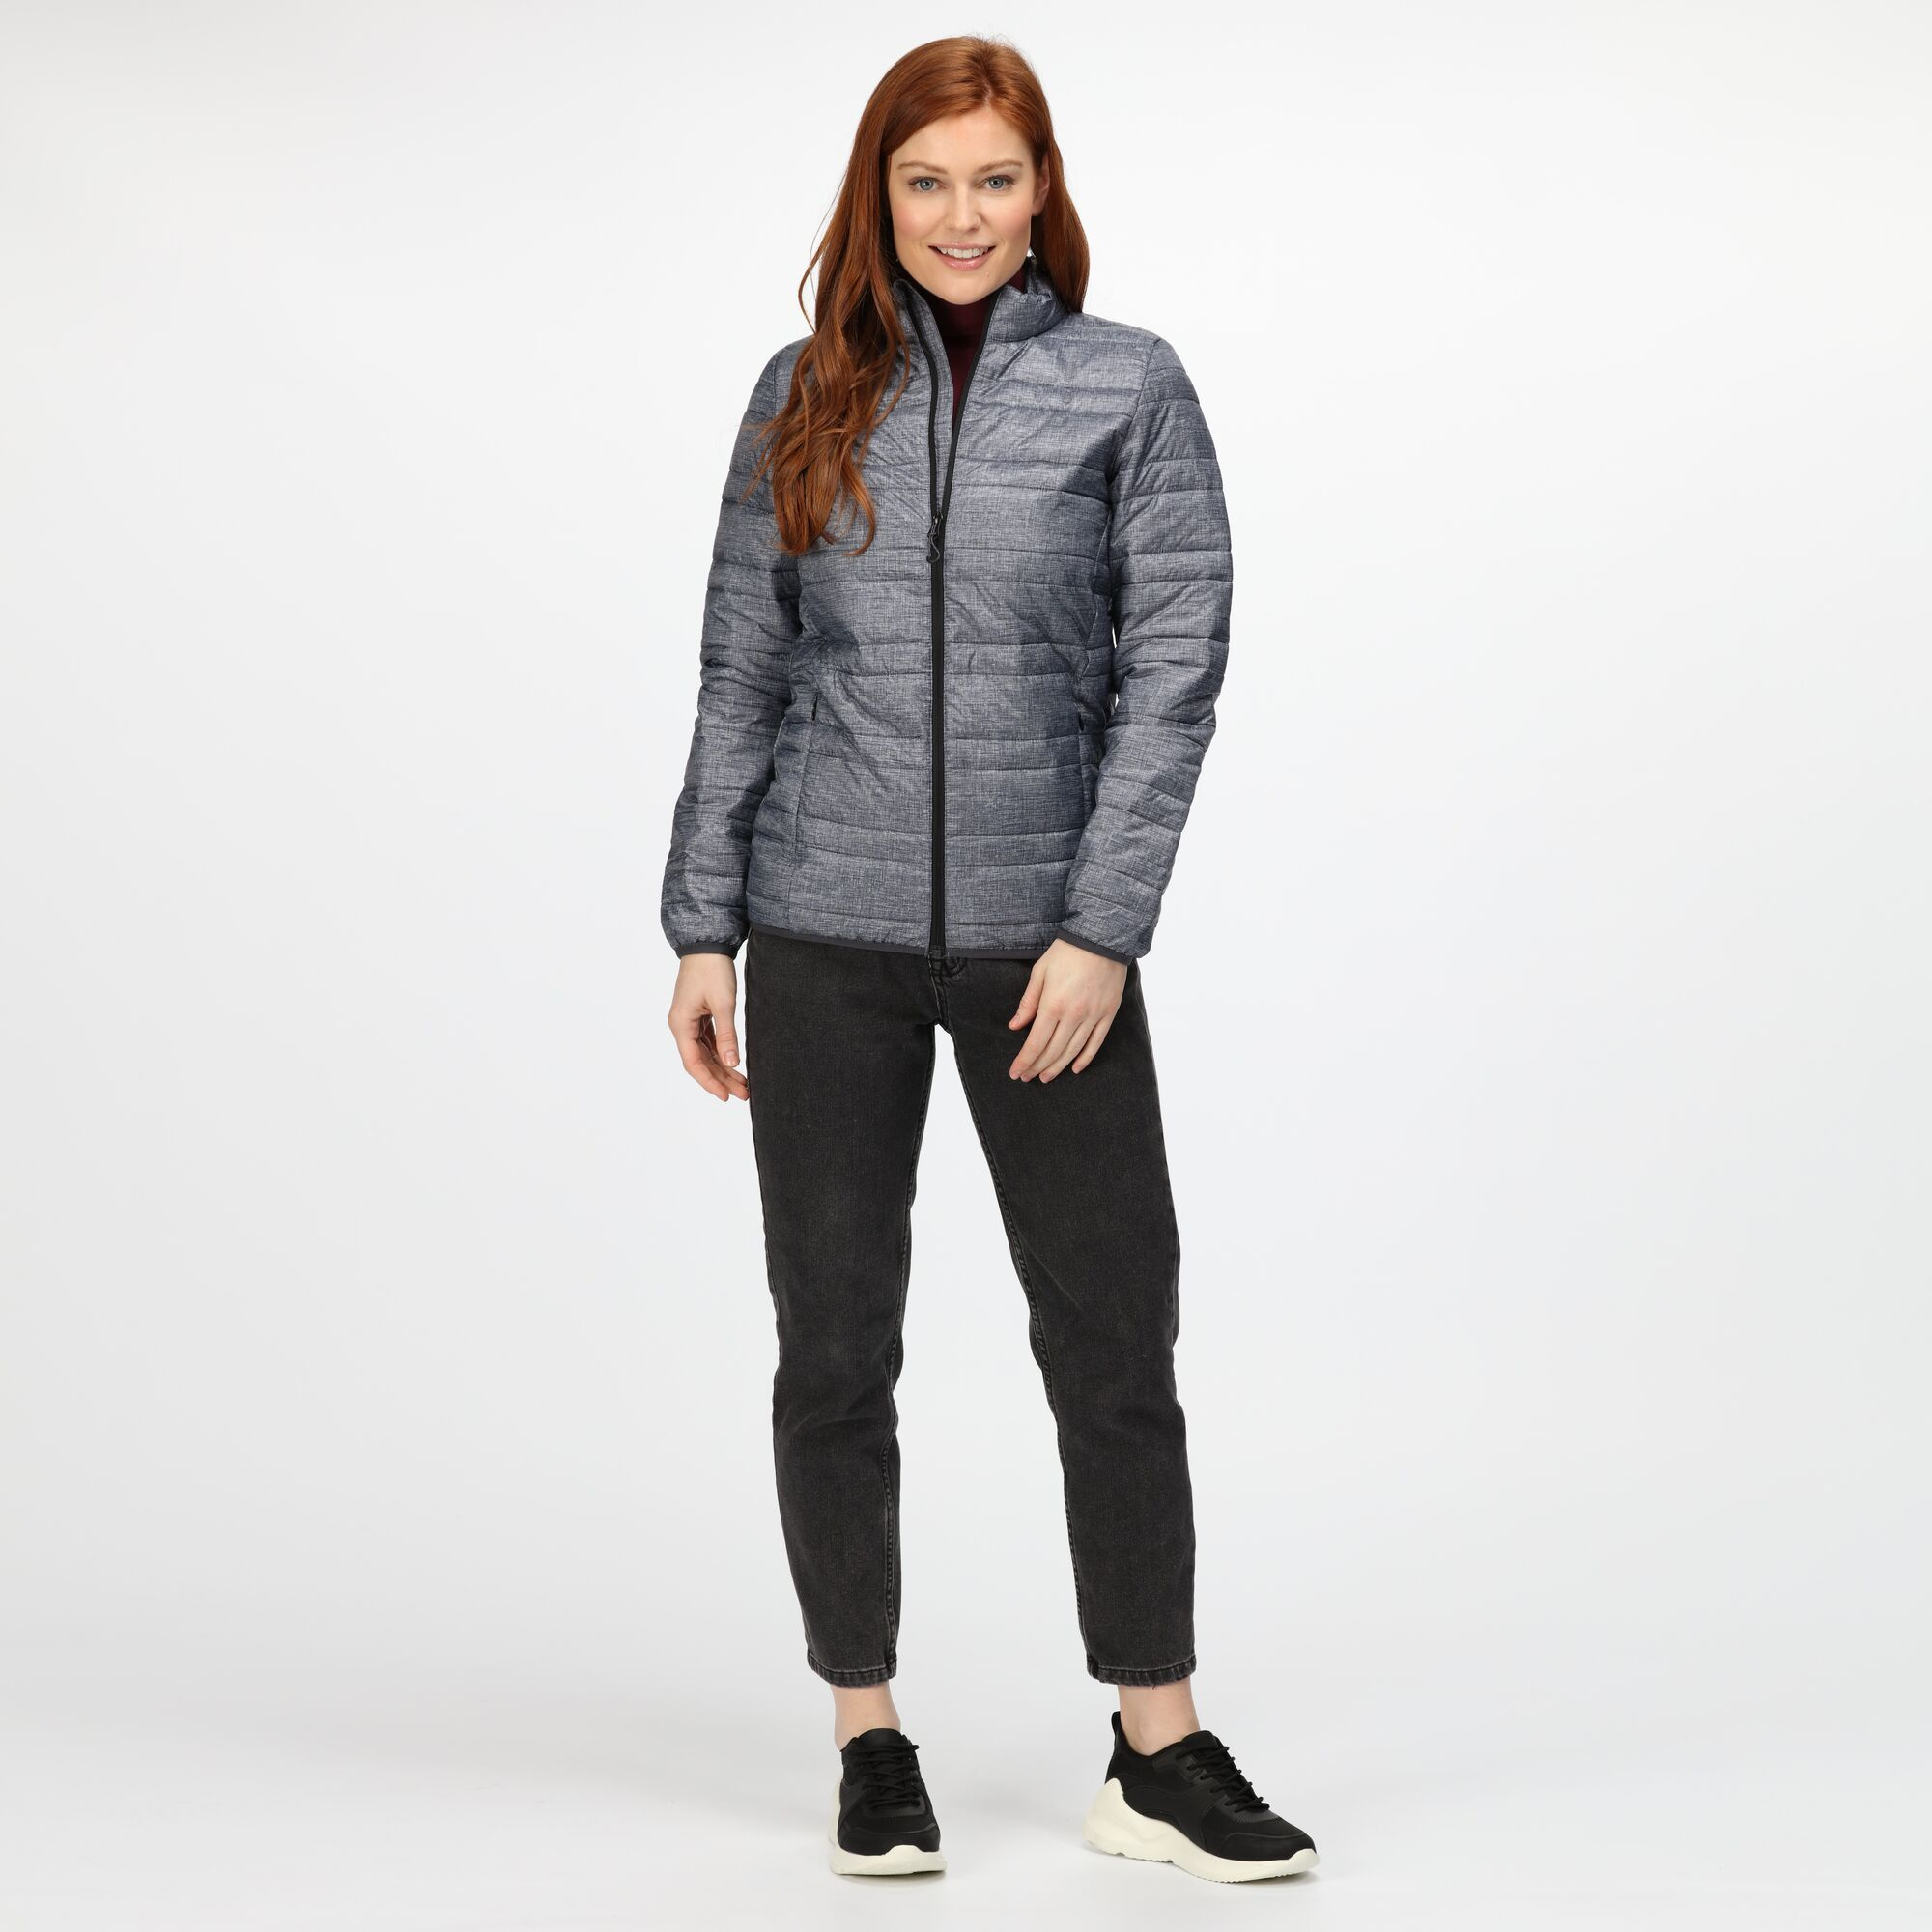 Regatta Professional Ladies/Womens Firedown Insulated Jacket (16) (Grey/Black Marl)